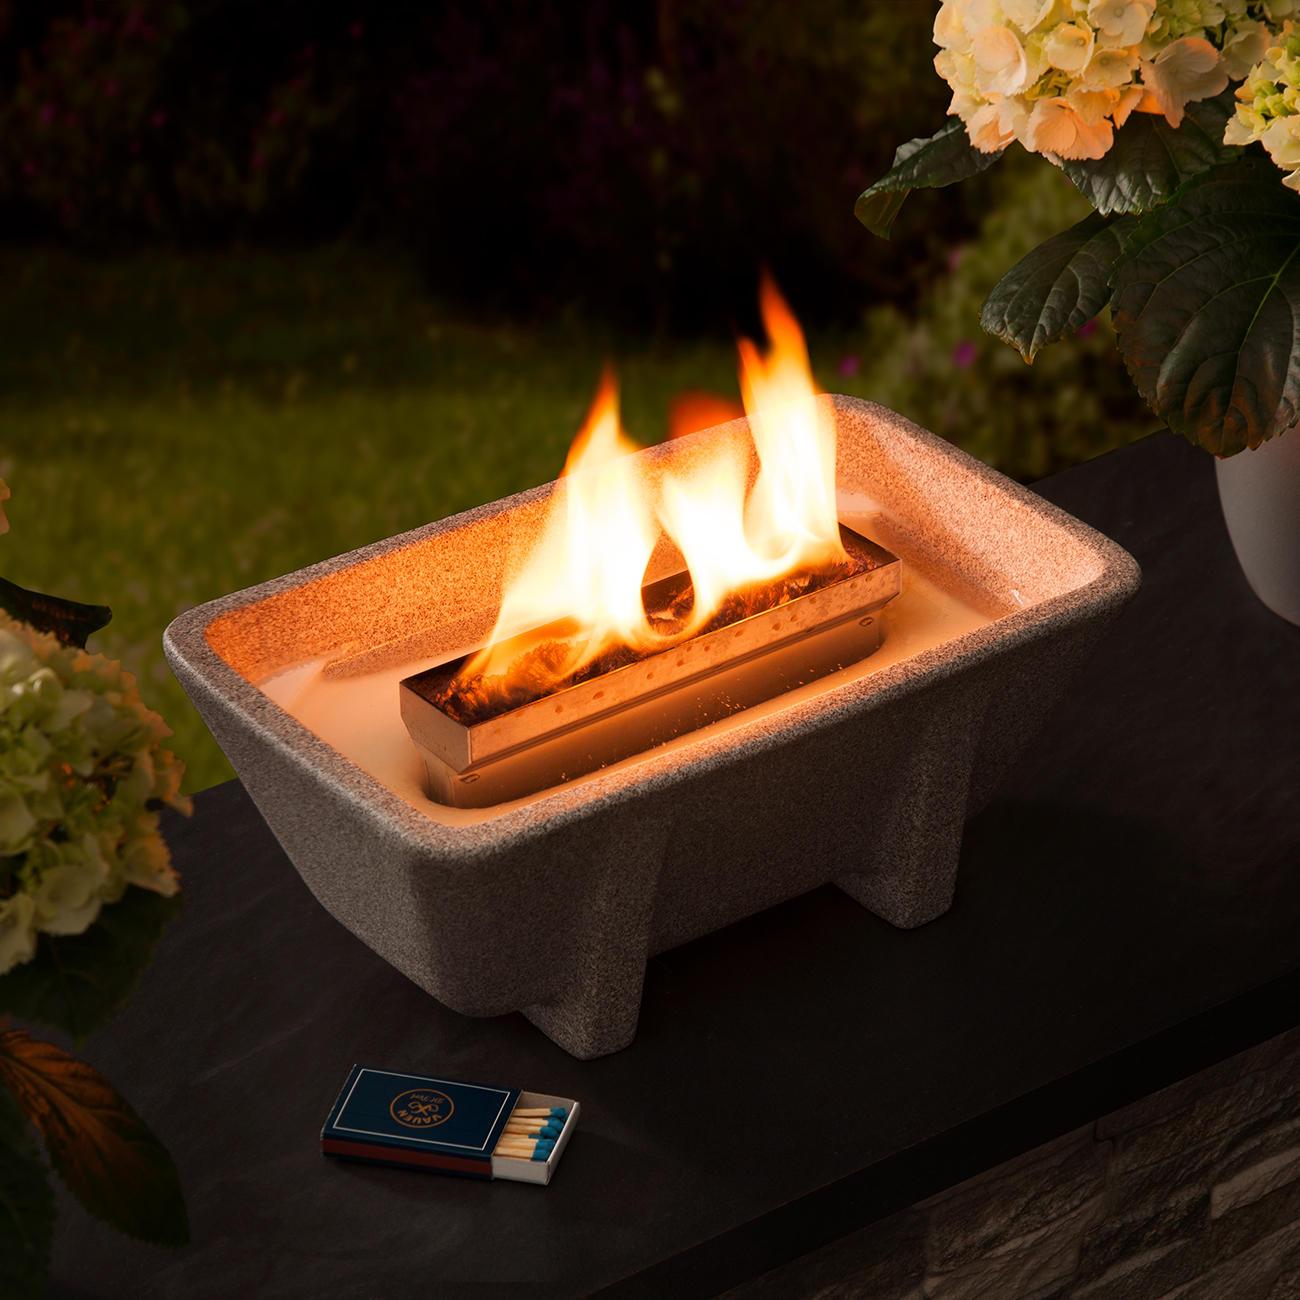 Blickfang Schmelzfeuer Outdoor Ideen Von Schmelzfeuer® Xl Granicium® - Romantic Candlelight –